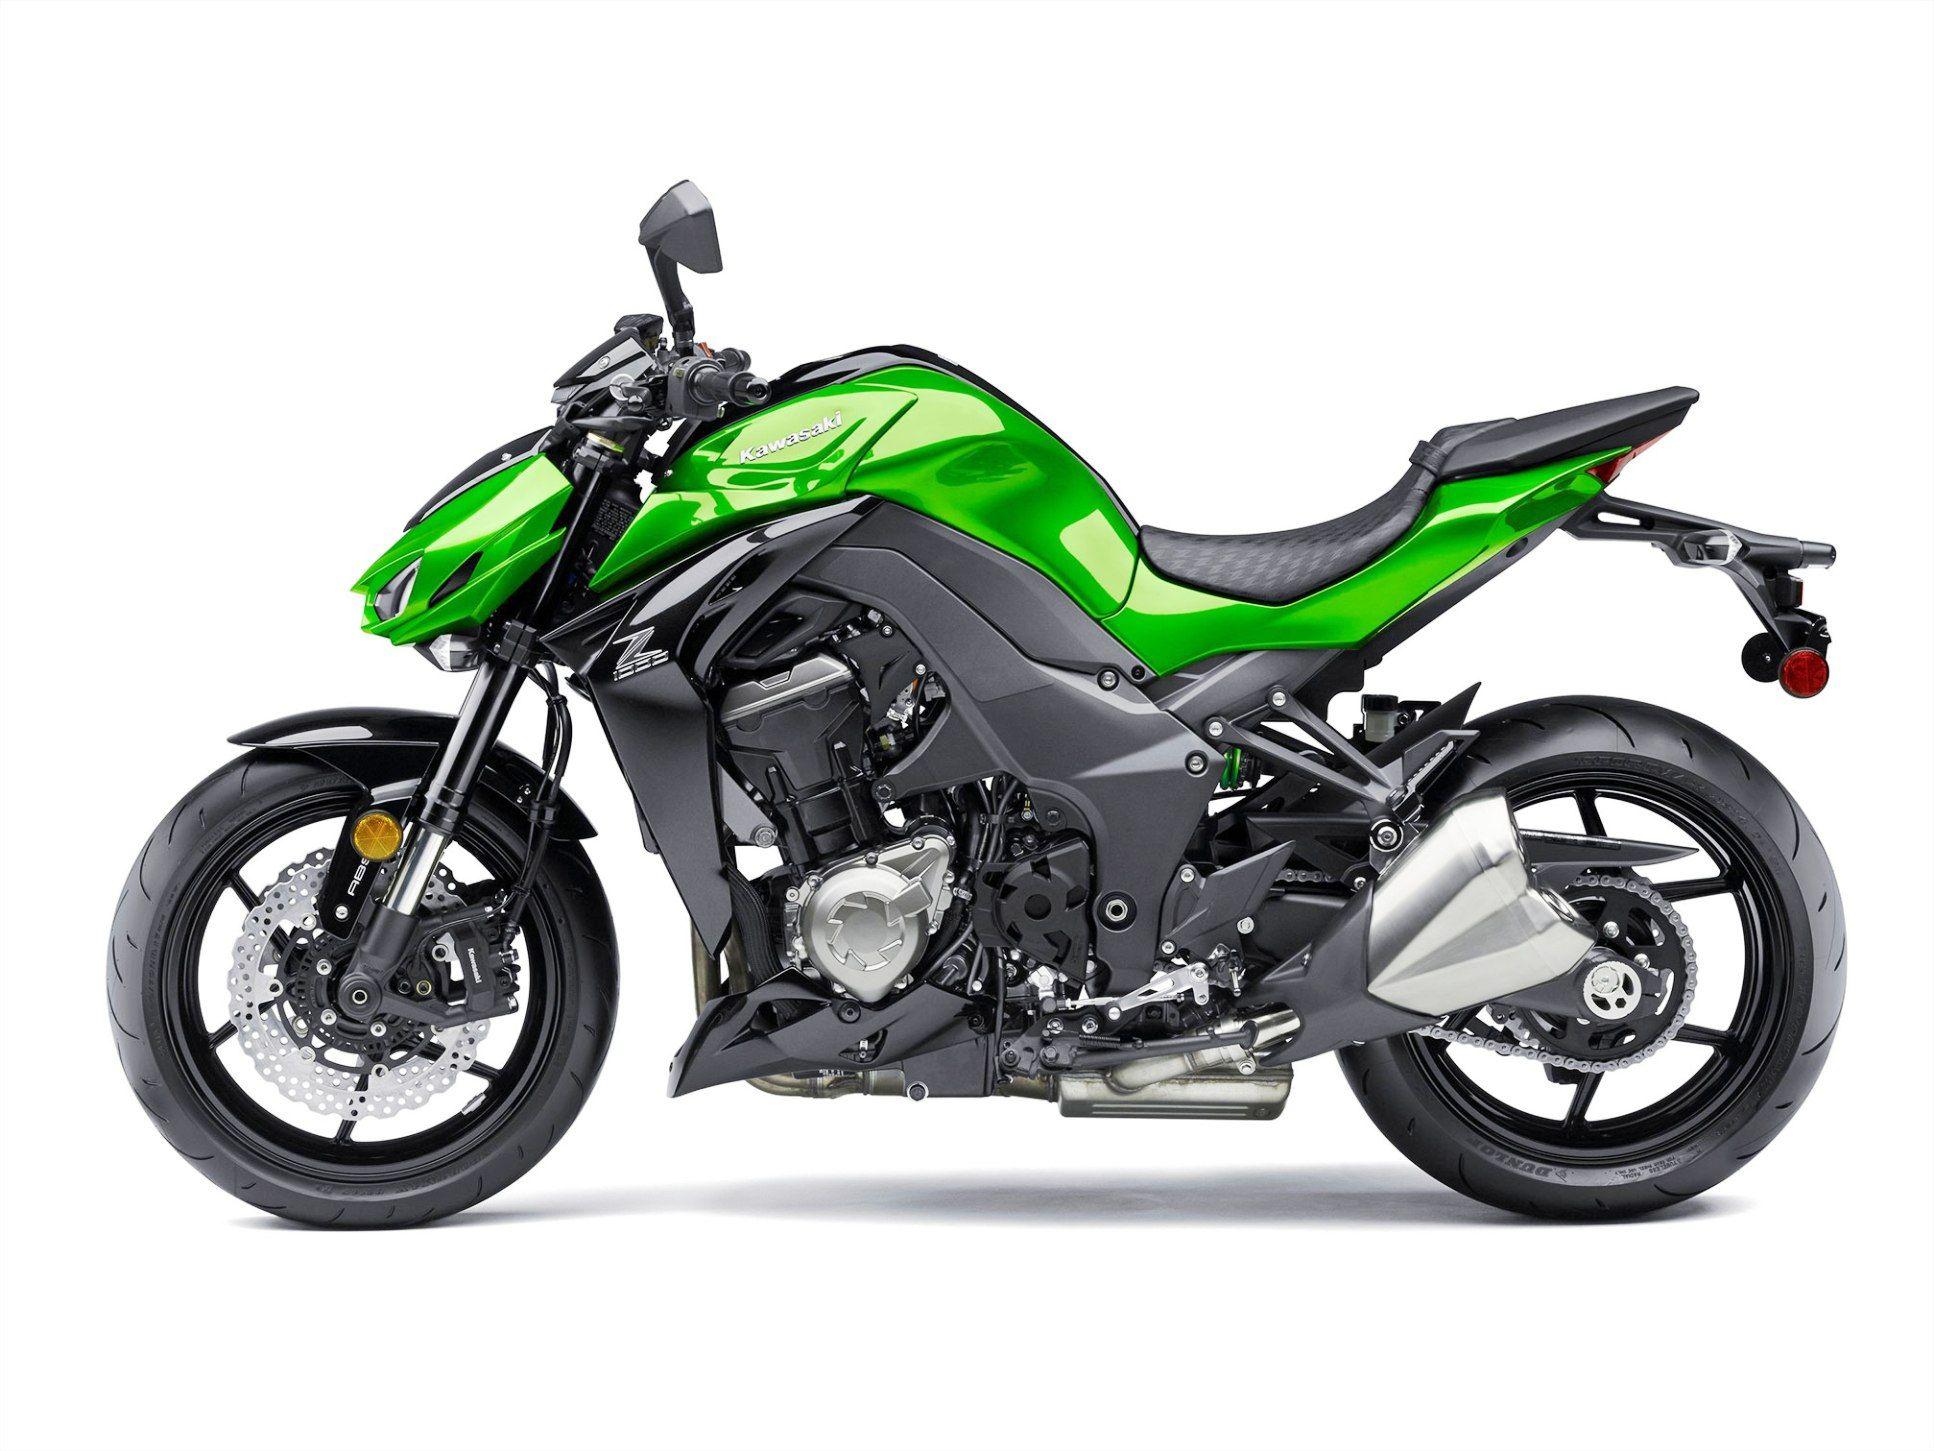 2015 Kawasaki Z1000 Abs Hd Wallpaper